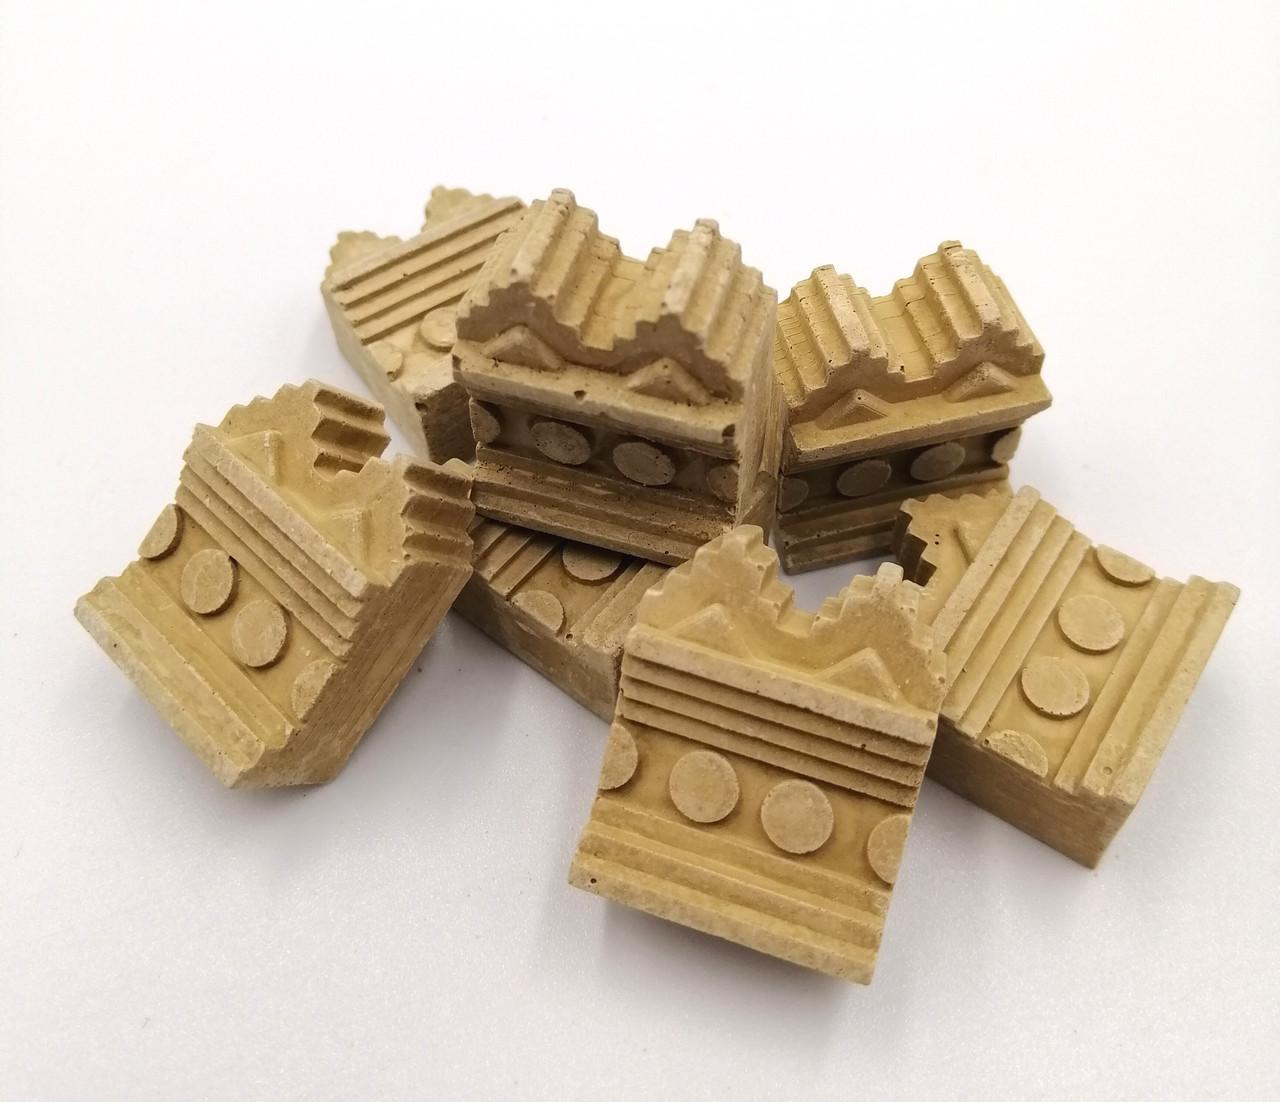 Зубці на стіну 100шт | Додаток до конструктора | Країна замків та фортець, Україна